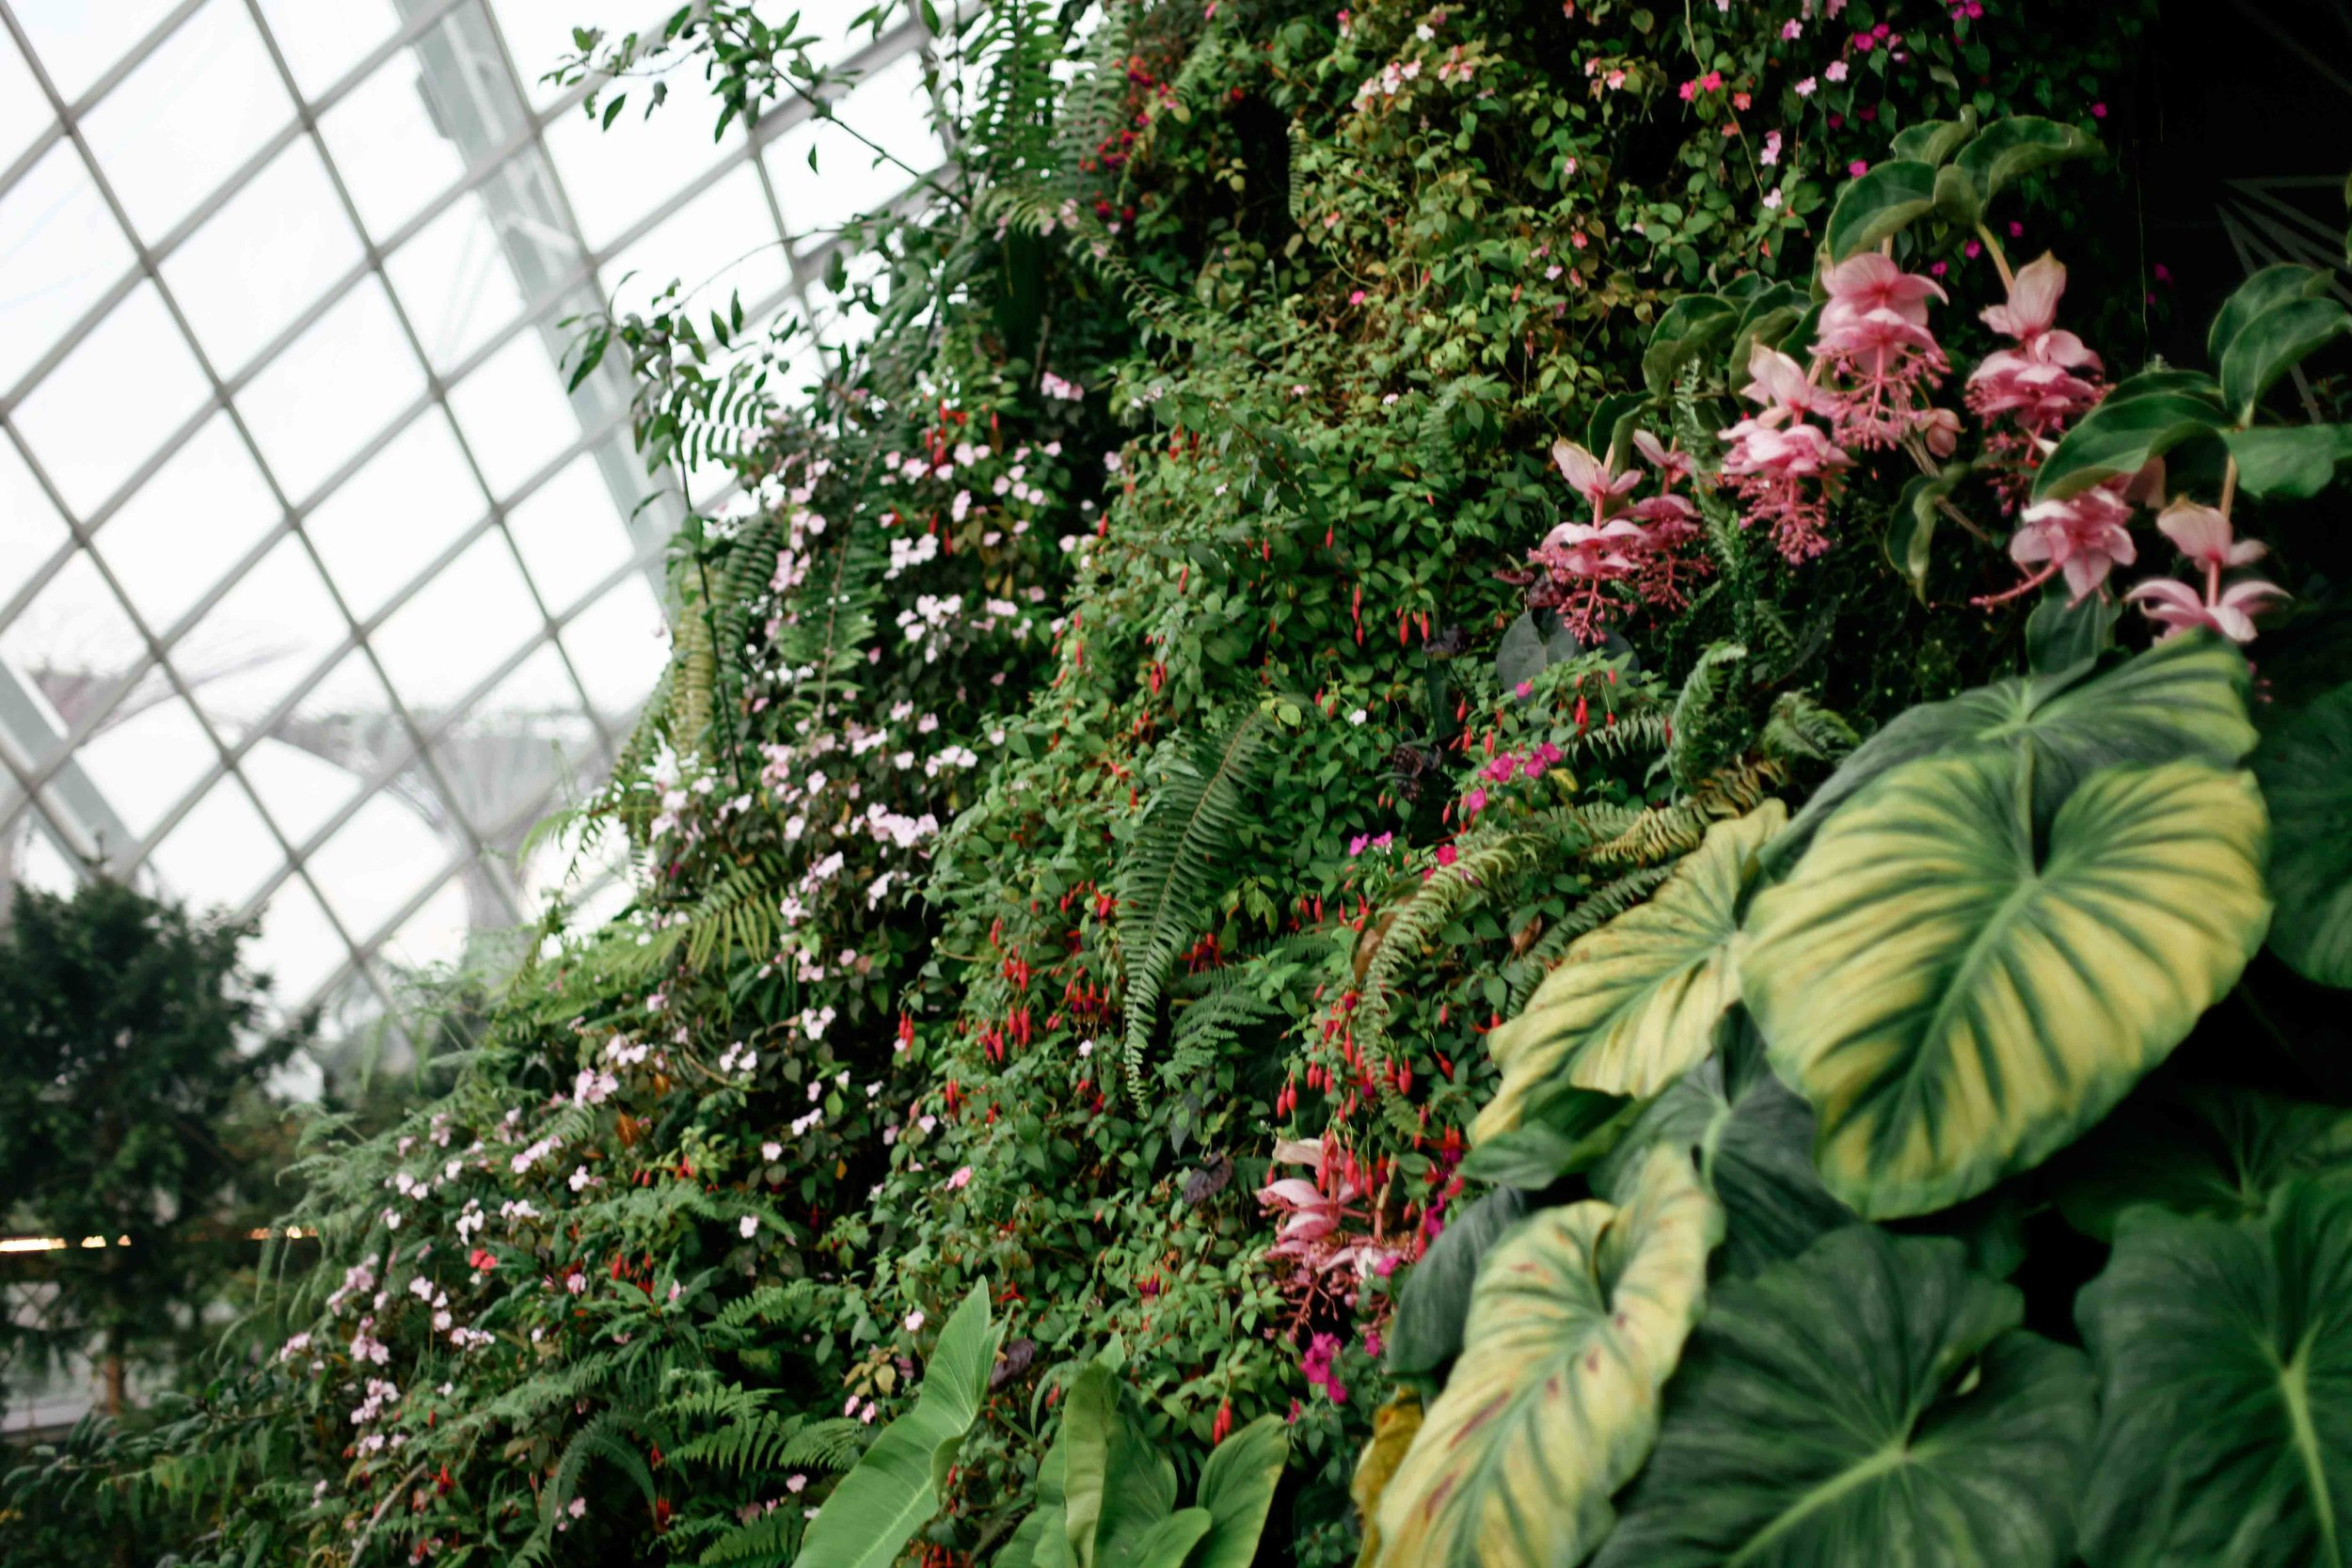 The wall of flowers like flows like a river